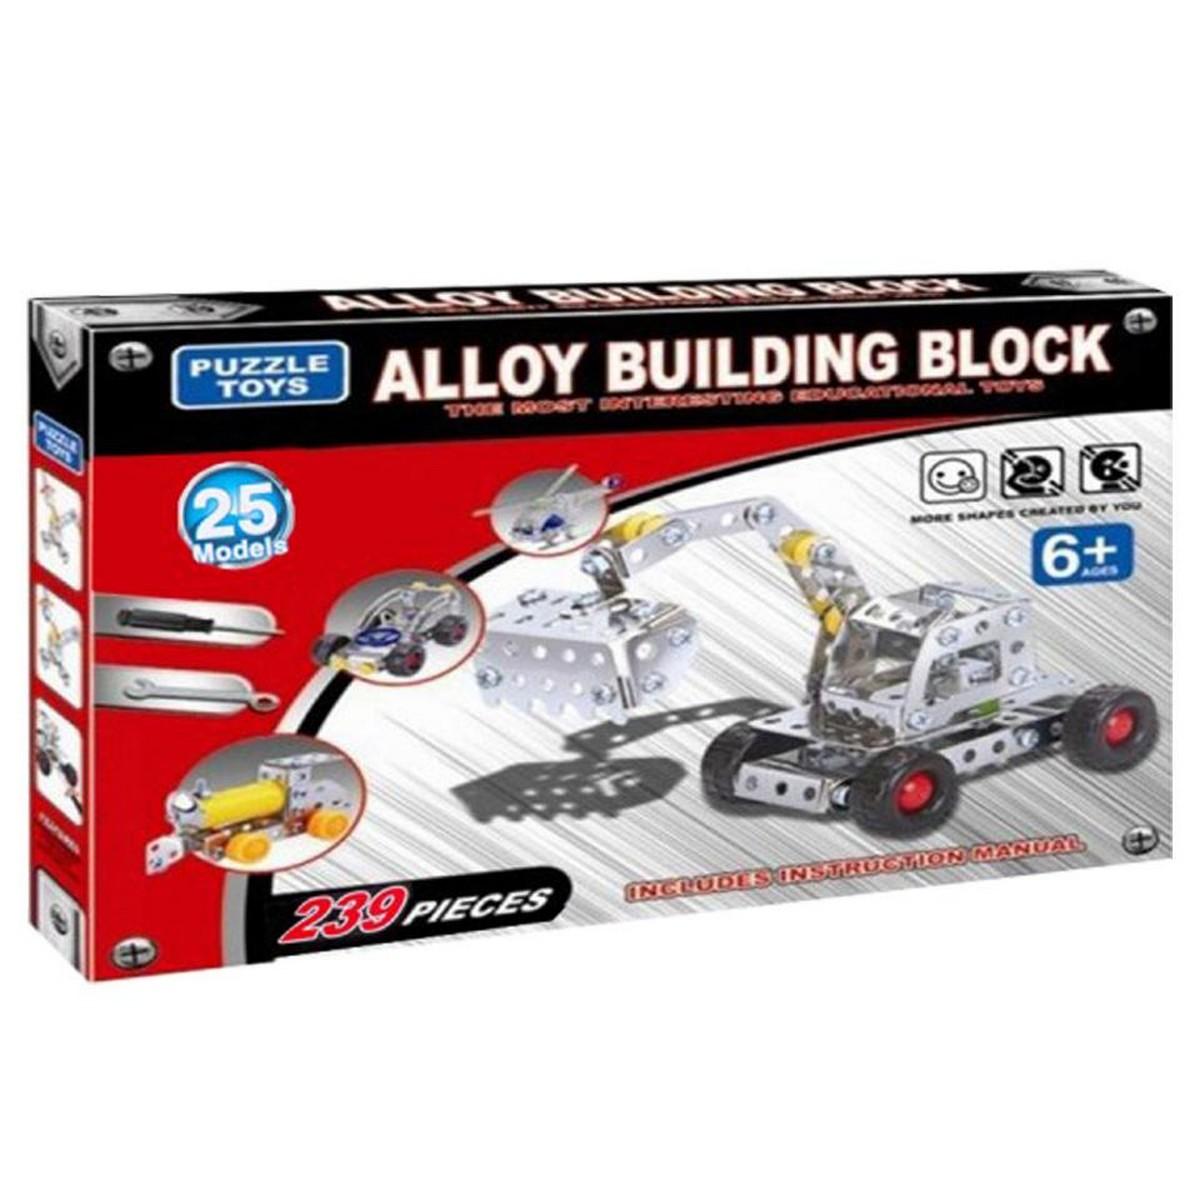 Metal Mechanics Building Tool Vehicles Set - Makes upto 25 Models